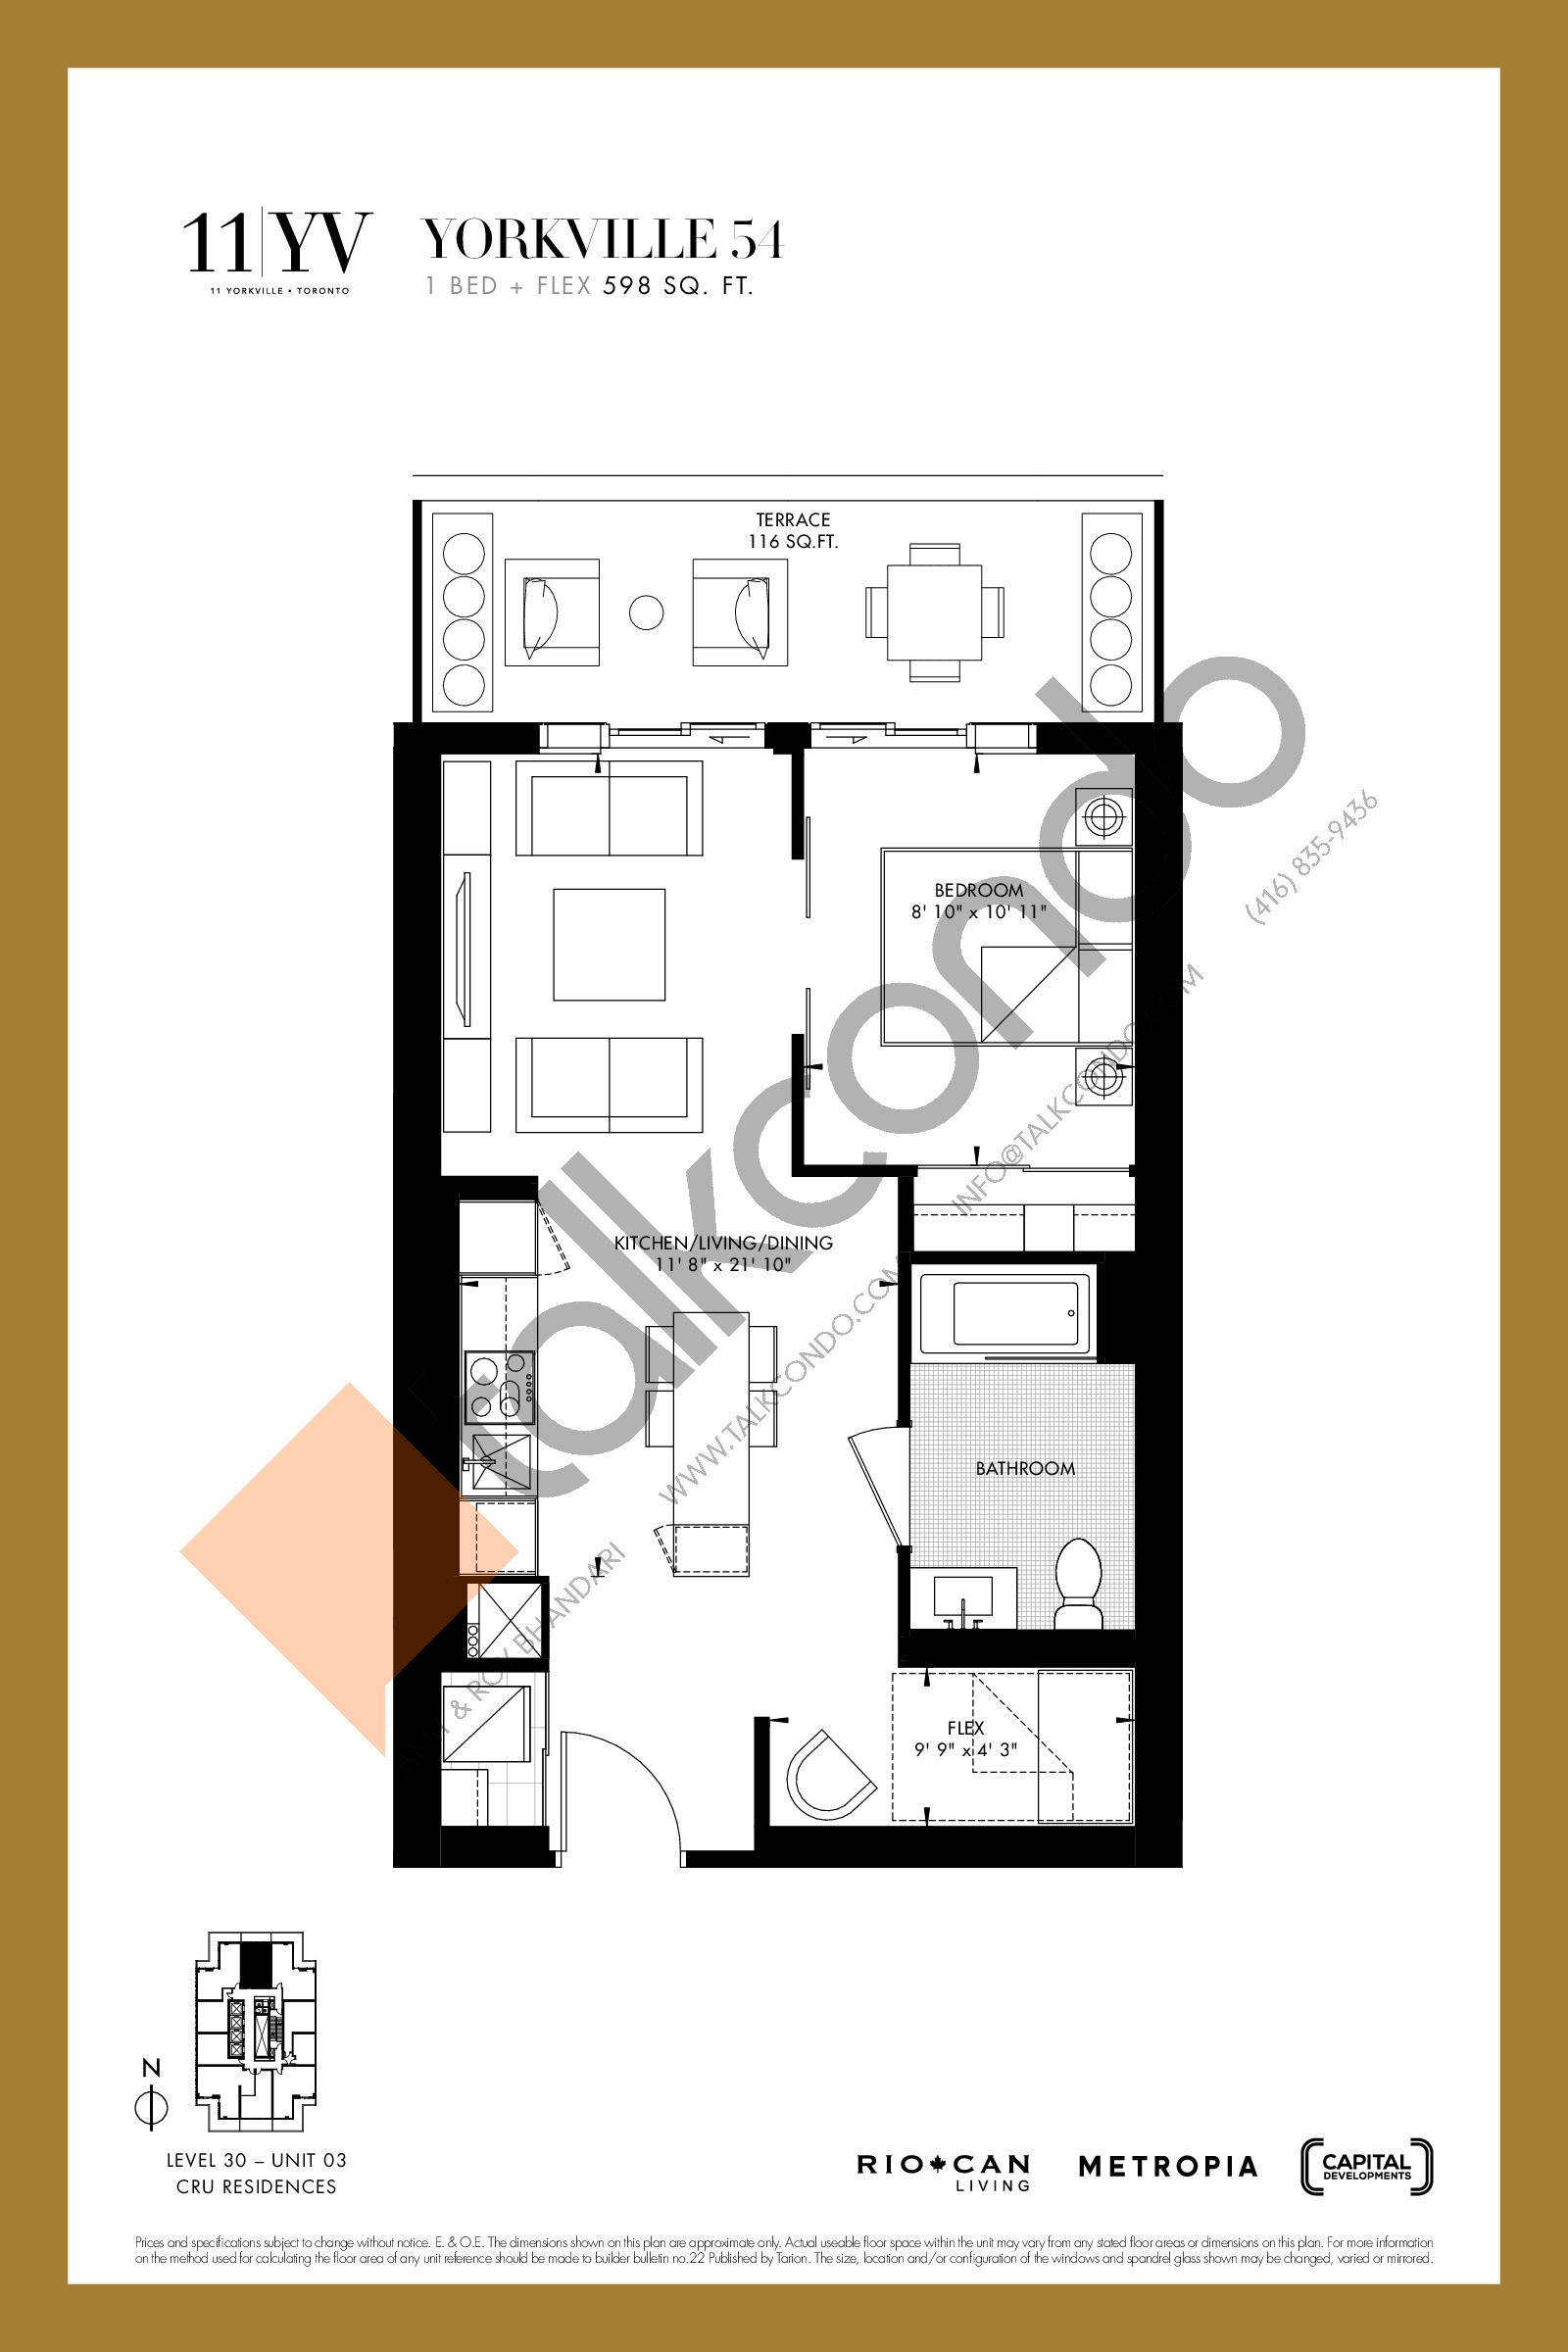 Yorkville 54 Floor Plan at 11YV Condos - 598 sq.ft